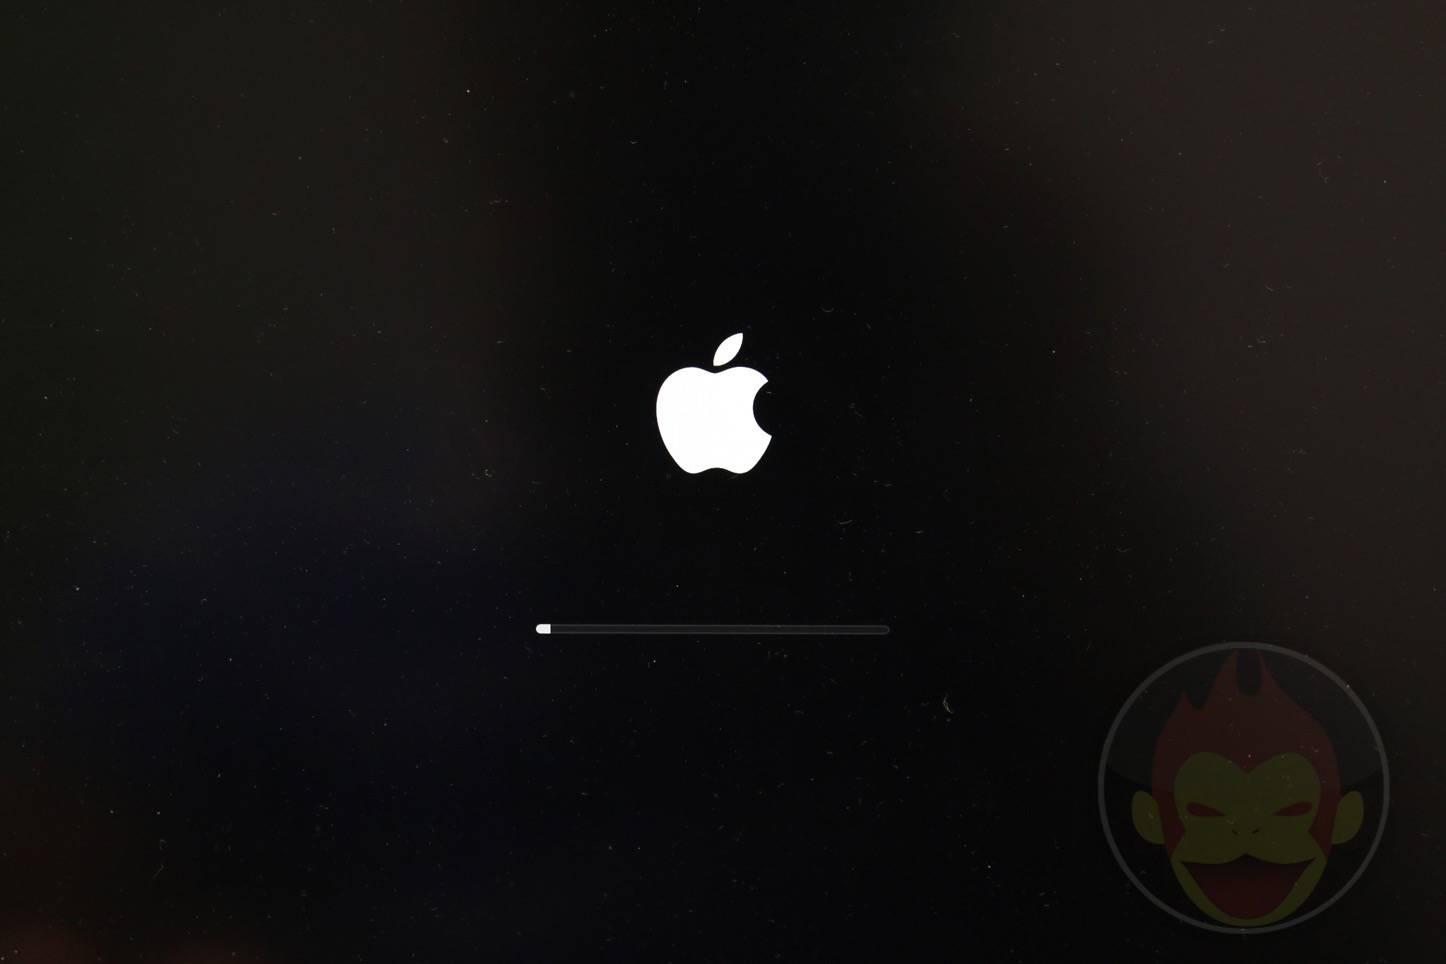 MacにOS Xを再インストールする方法